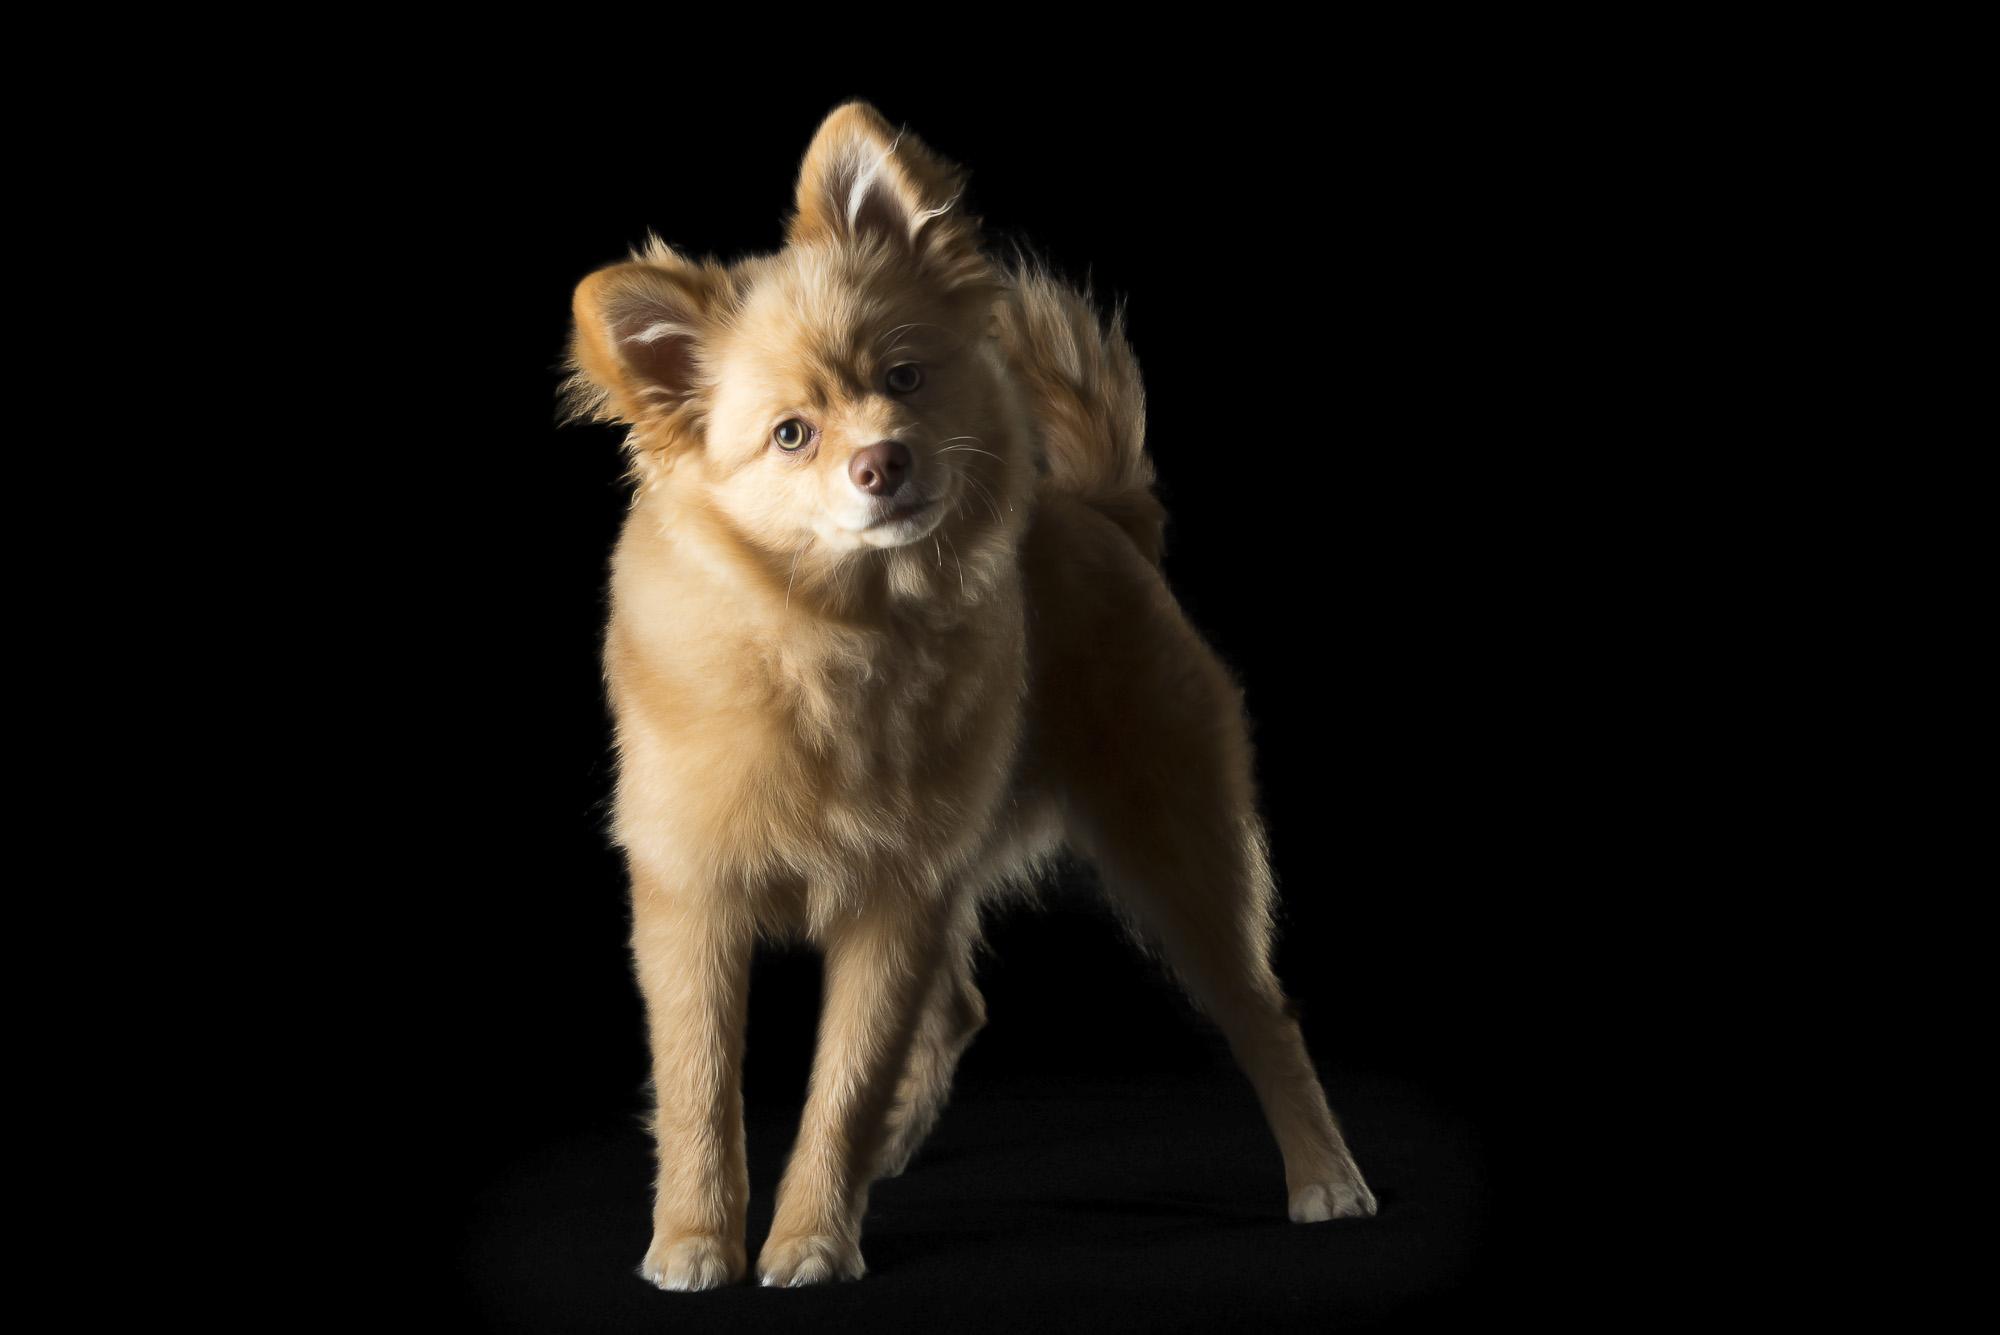 LupinBay-0128-German-Spitz-Dog-Photography-2784.jpg